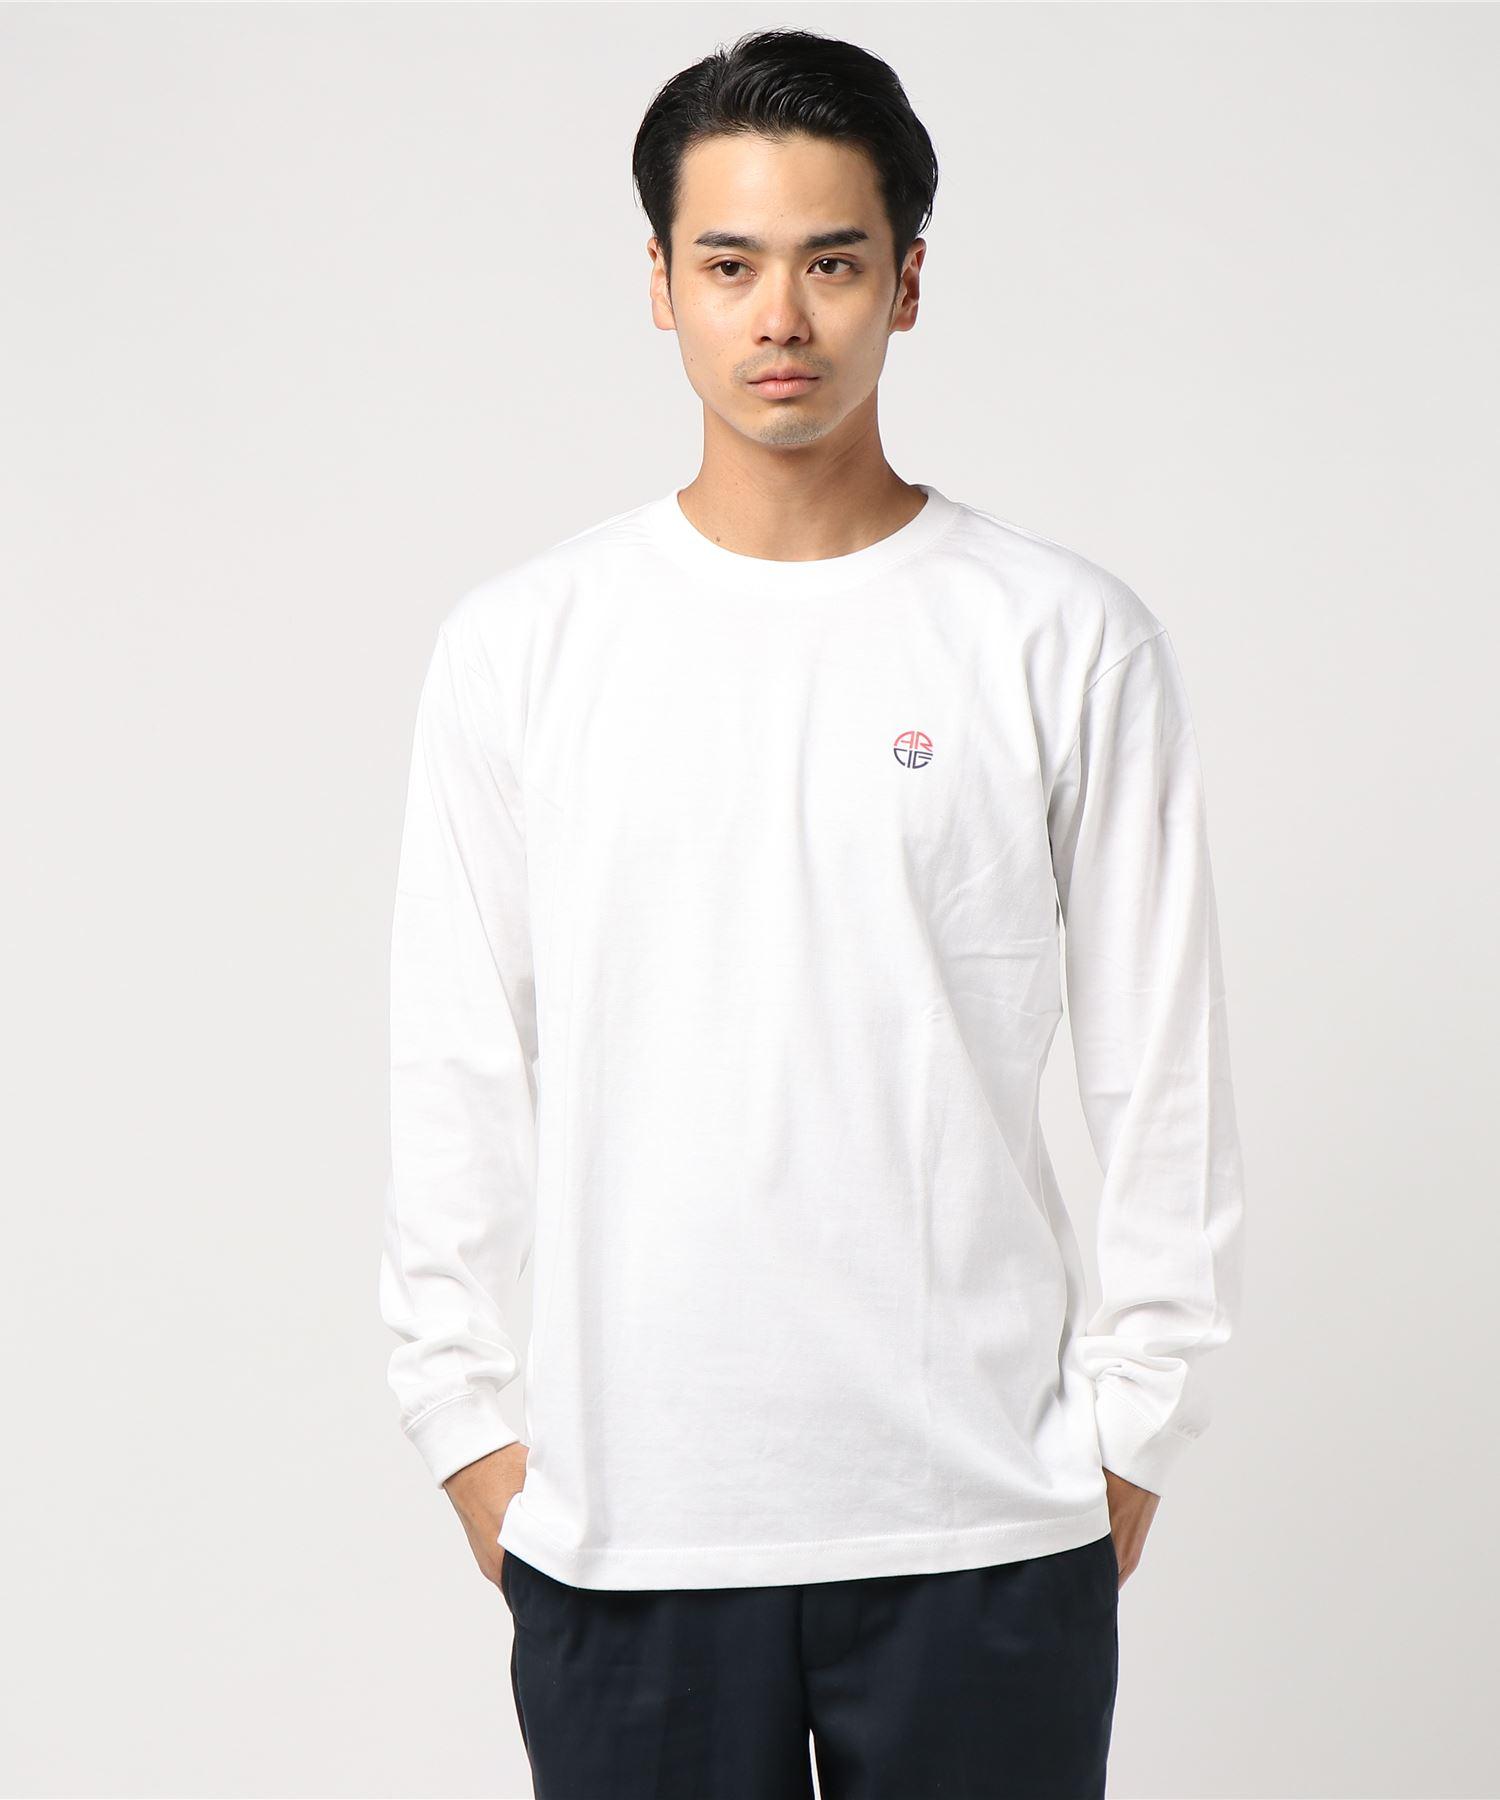 American Rag Cie ARC Block Logo Print Longsleeve T Shirt/アメリカンラグシー ARCブロックロゴプリントロンT